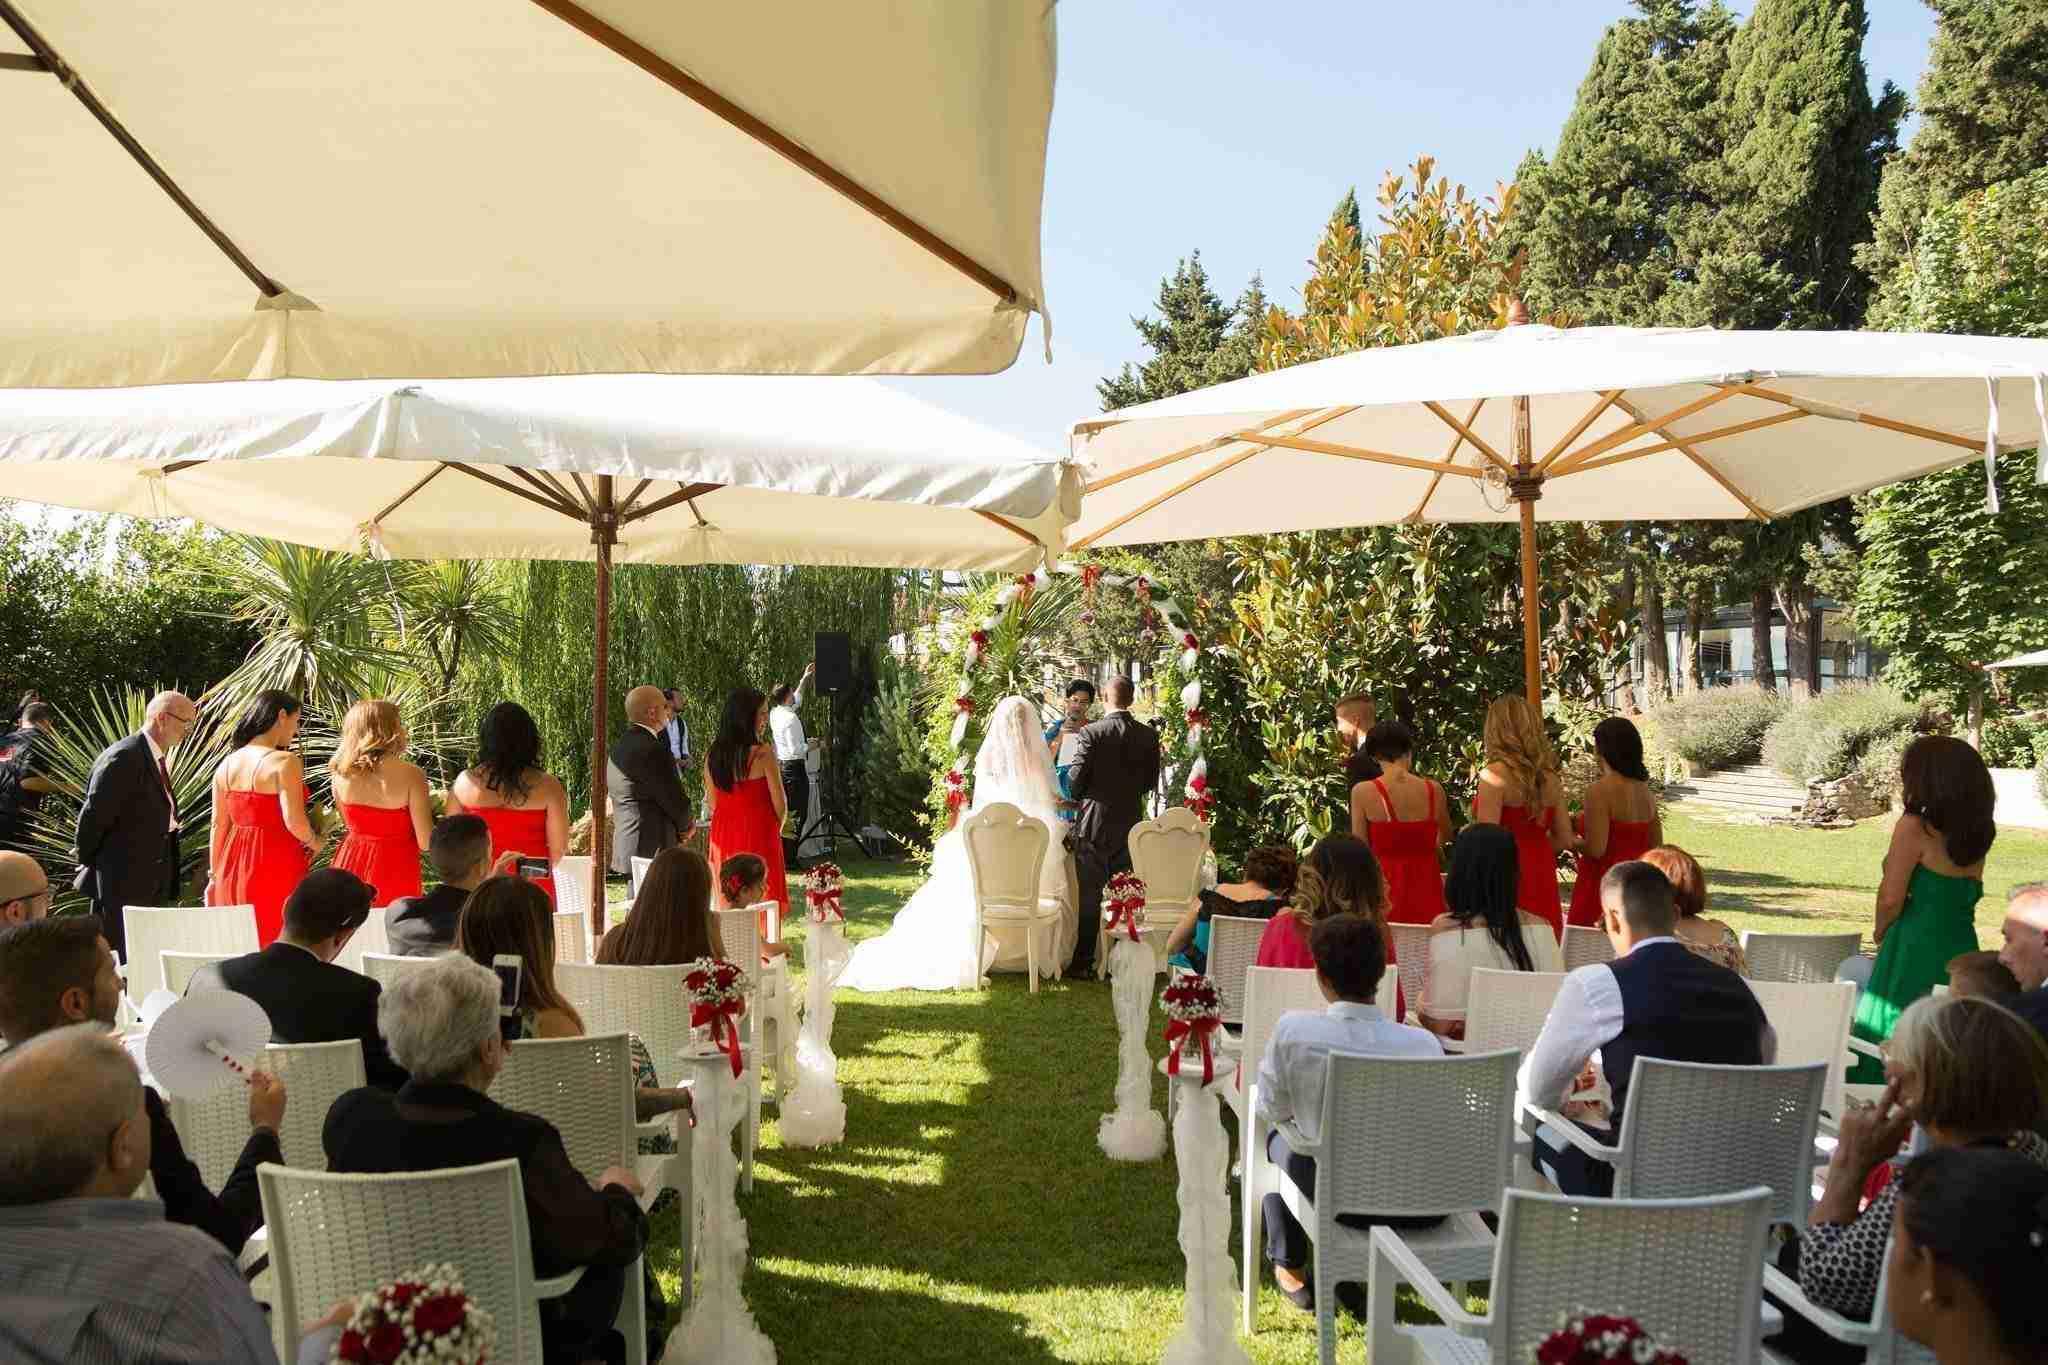 Matrimonio al Casale Baldetti: Giardino Esterno, ricevimento